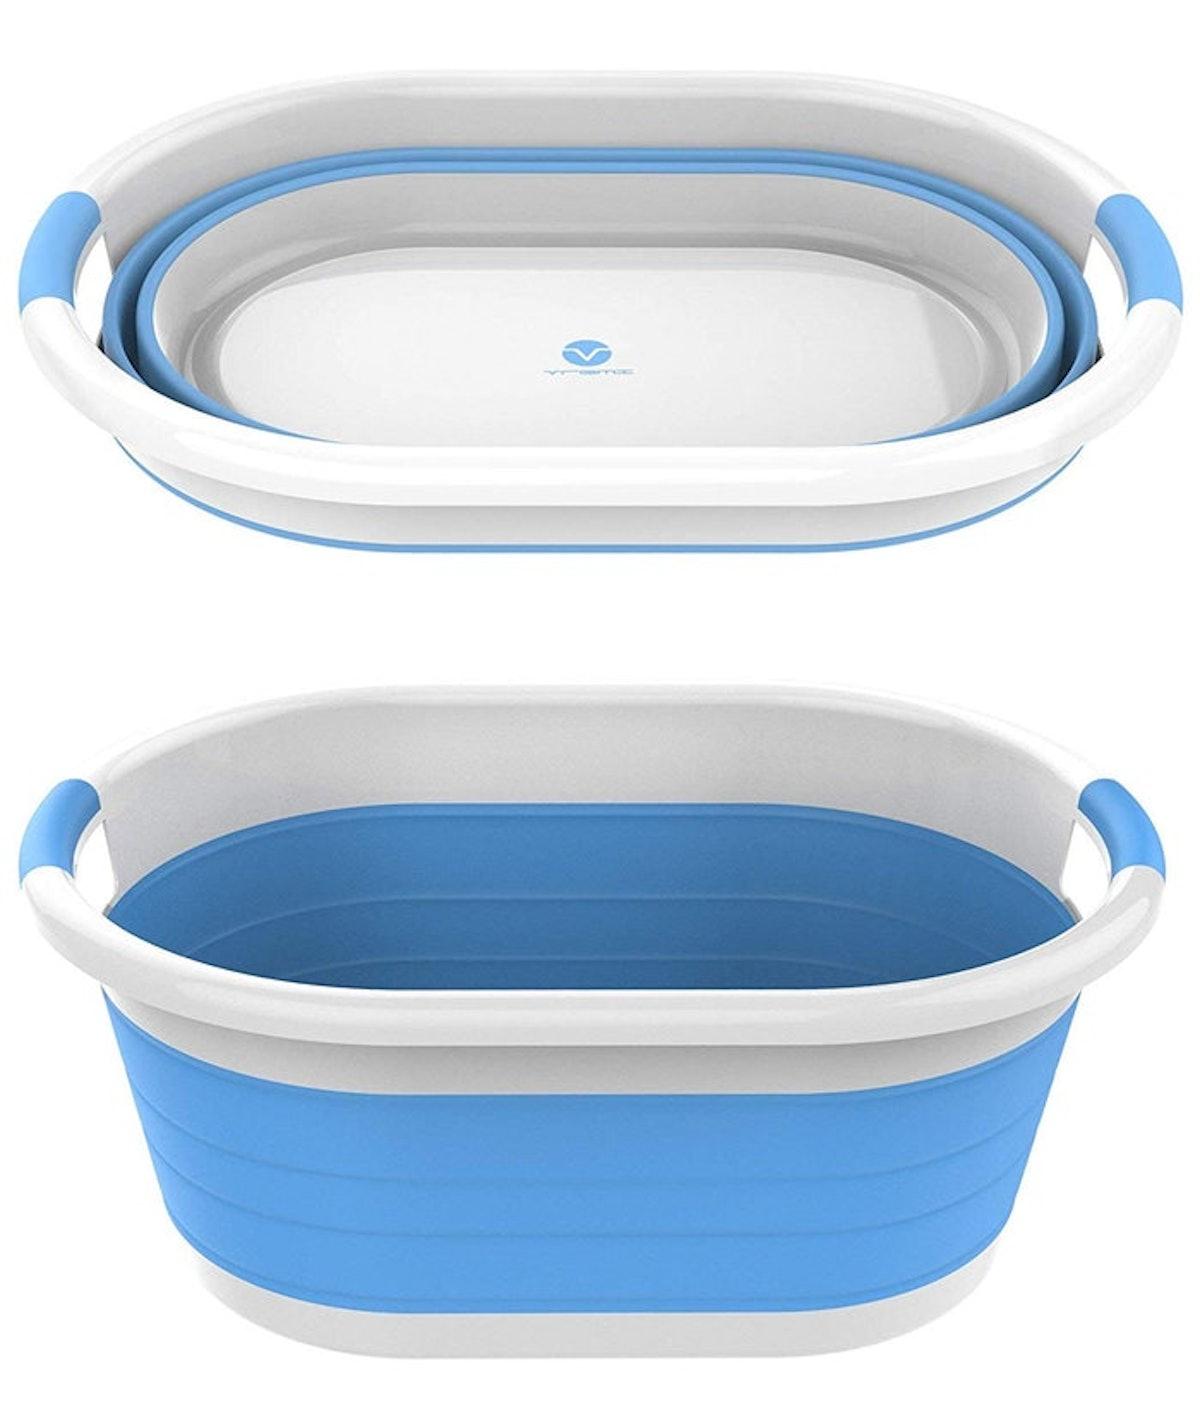 Vremi Collapsible Plastic Laundry Basket